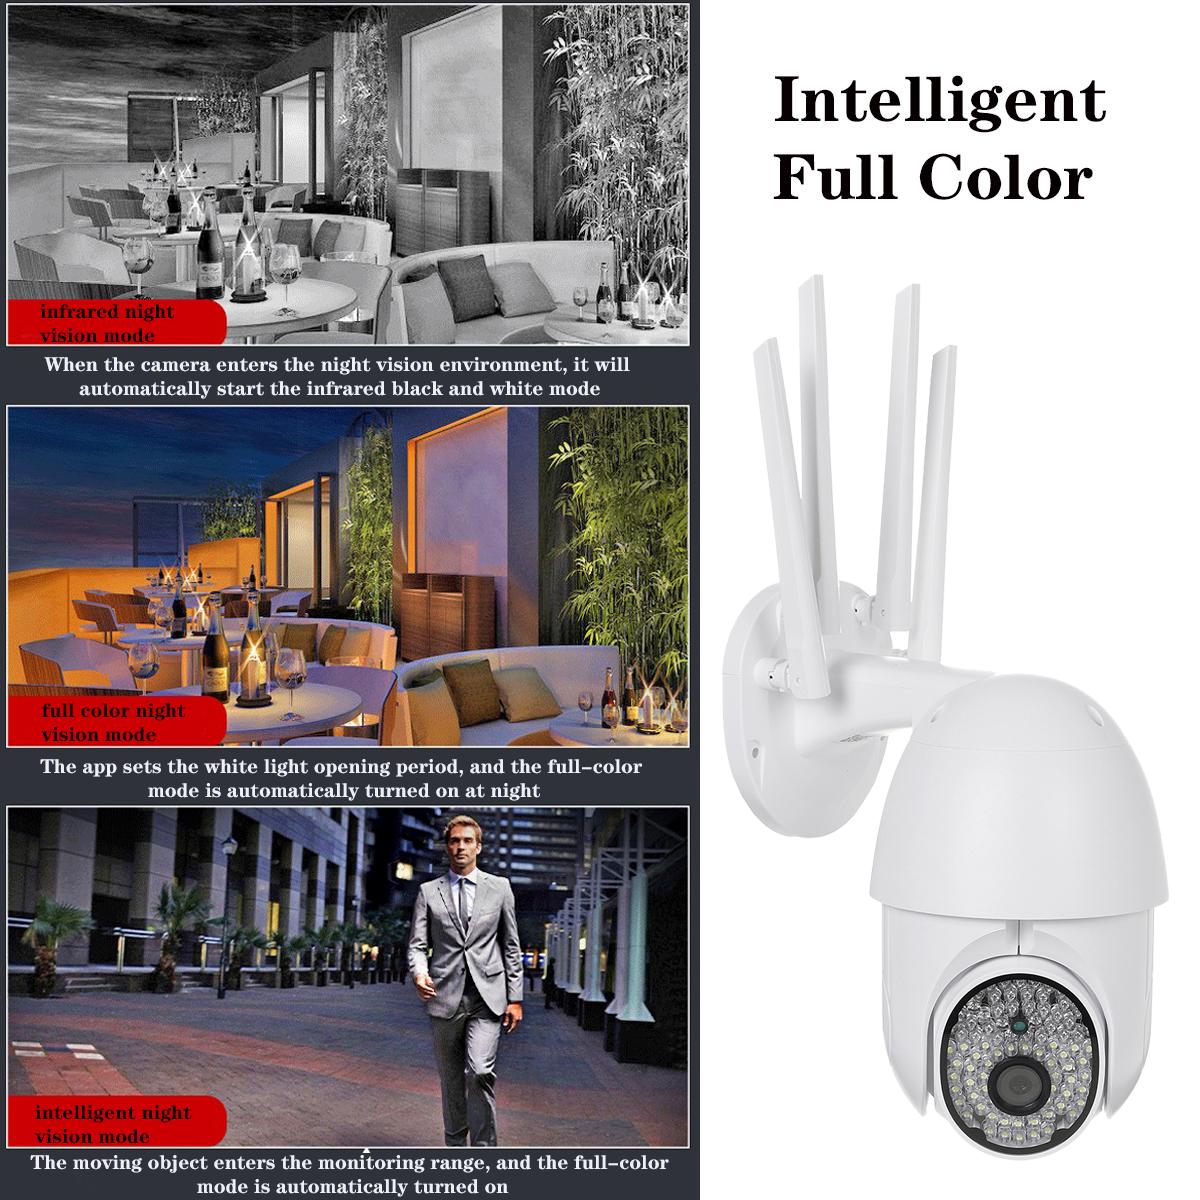 Bakeey 88LEDs 1080P WIFI IP Camera Night Vision Two Way Intercom Wireless Outdoor CCTV HD PTZ Smart Home Security 360 IR Monitor